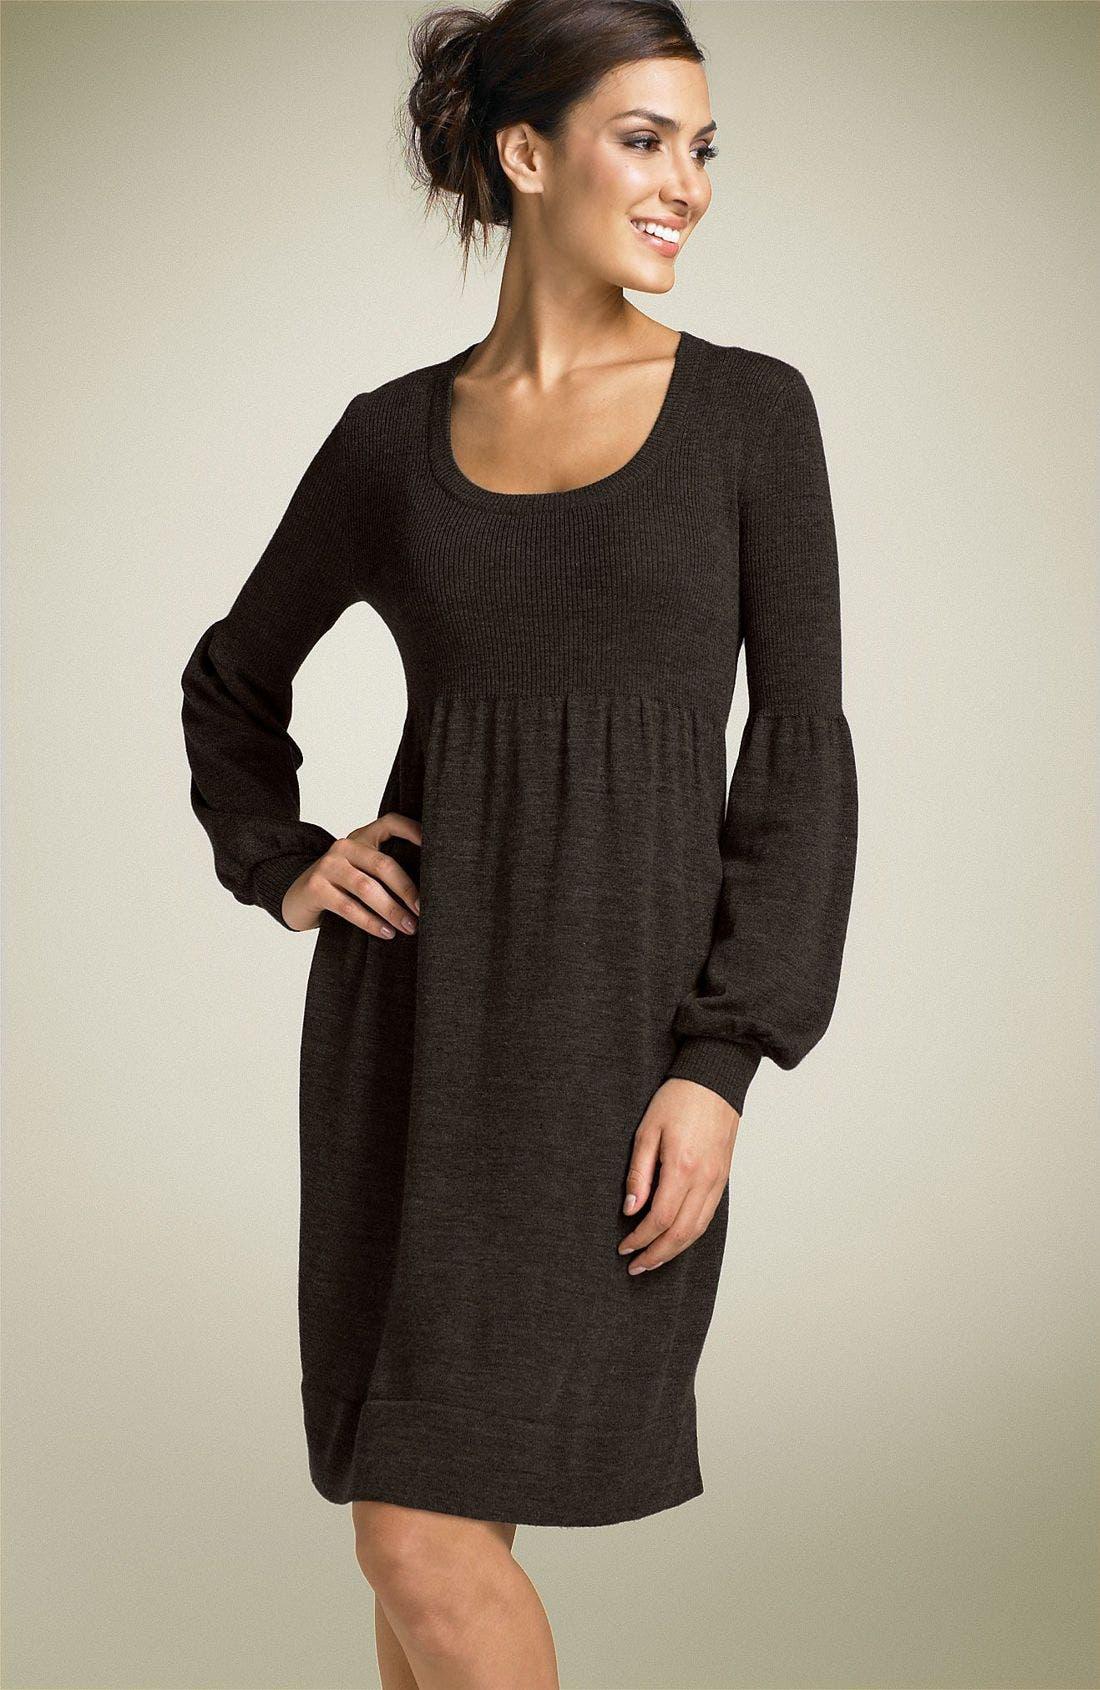 Main Image - Calvin Klein Scoop Neck Sweater Dress